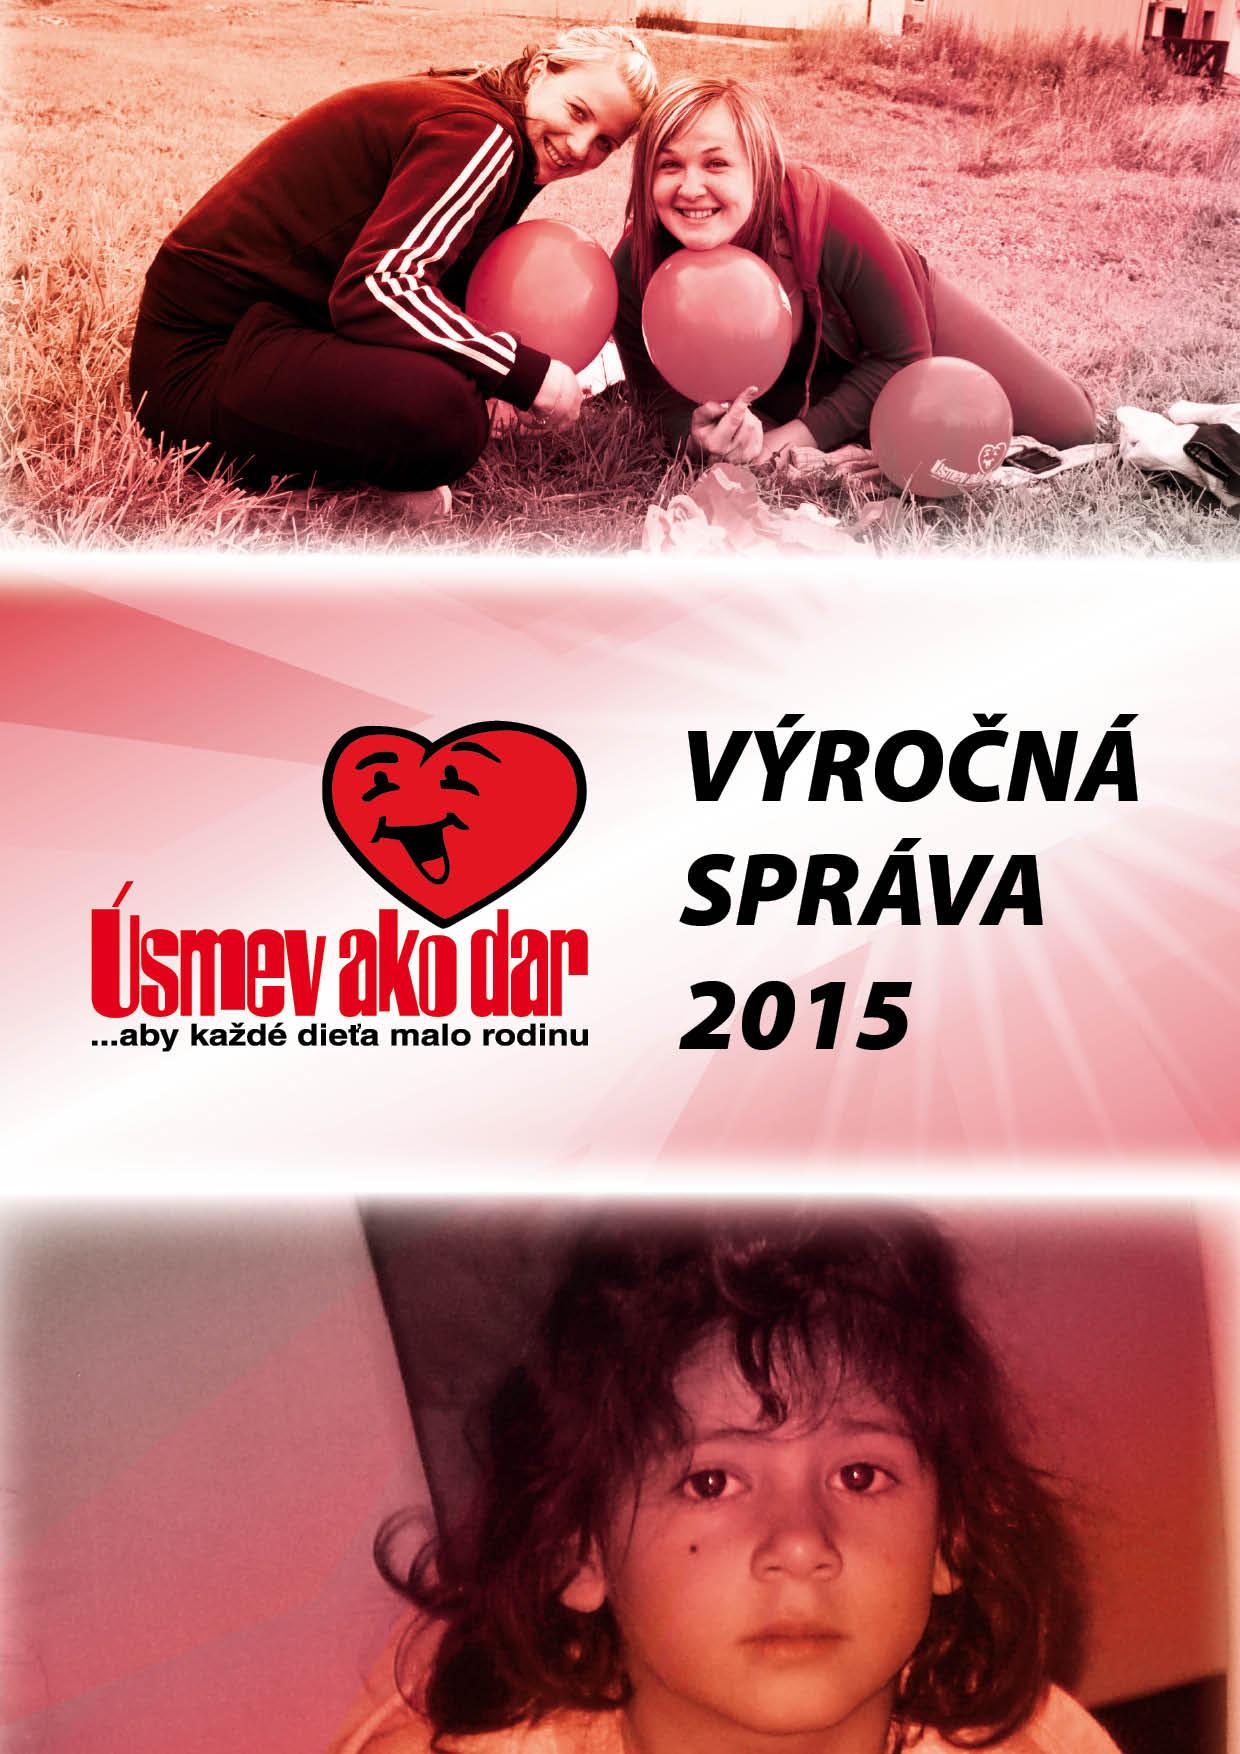 UAD Vyrocna sprava 2015 prva